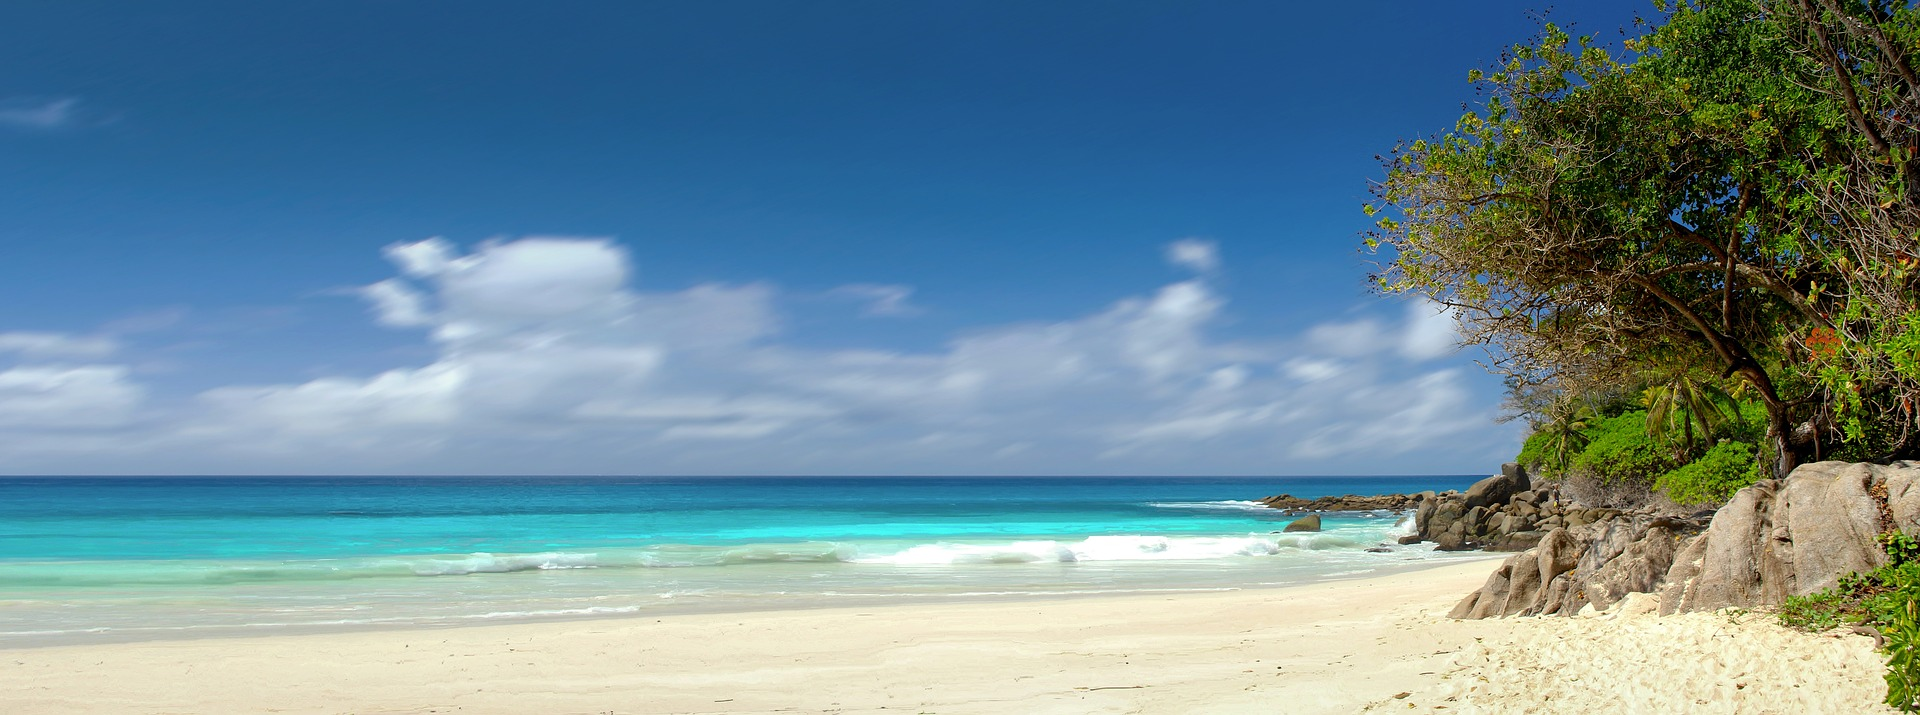 Seychelles honeymoon destination